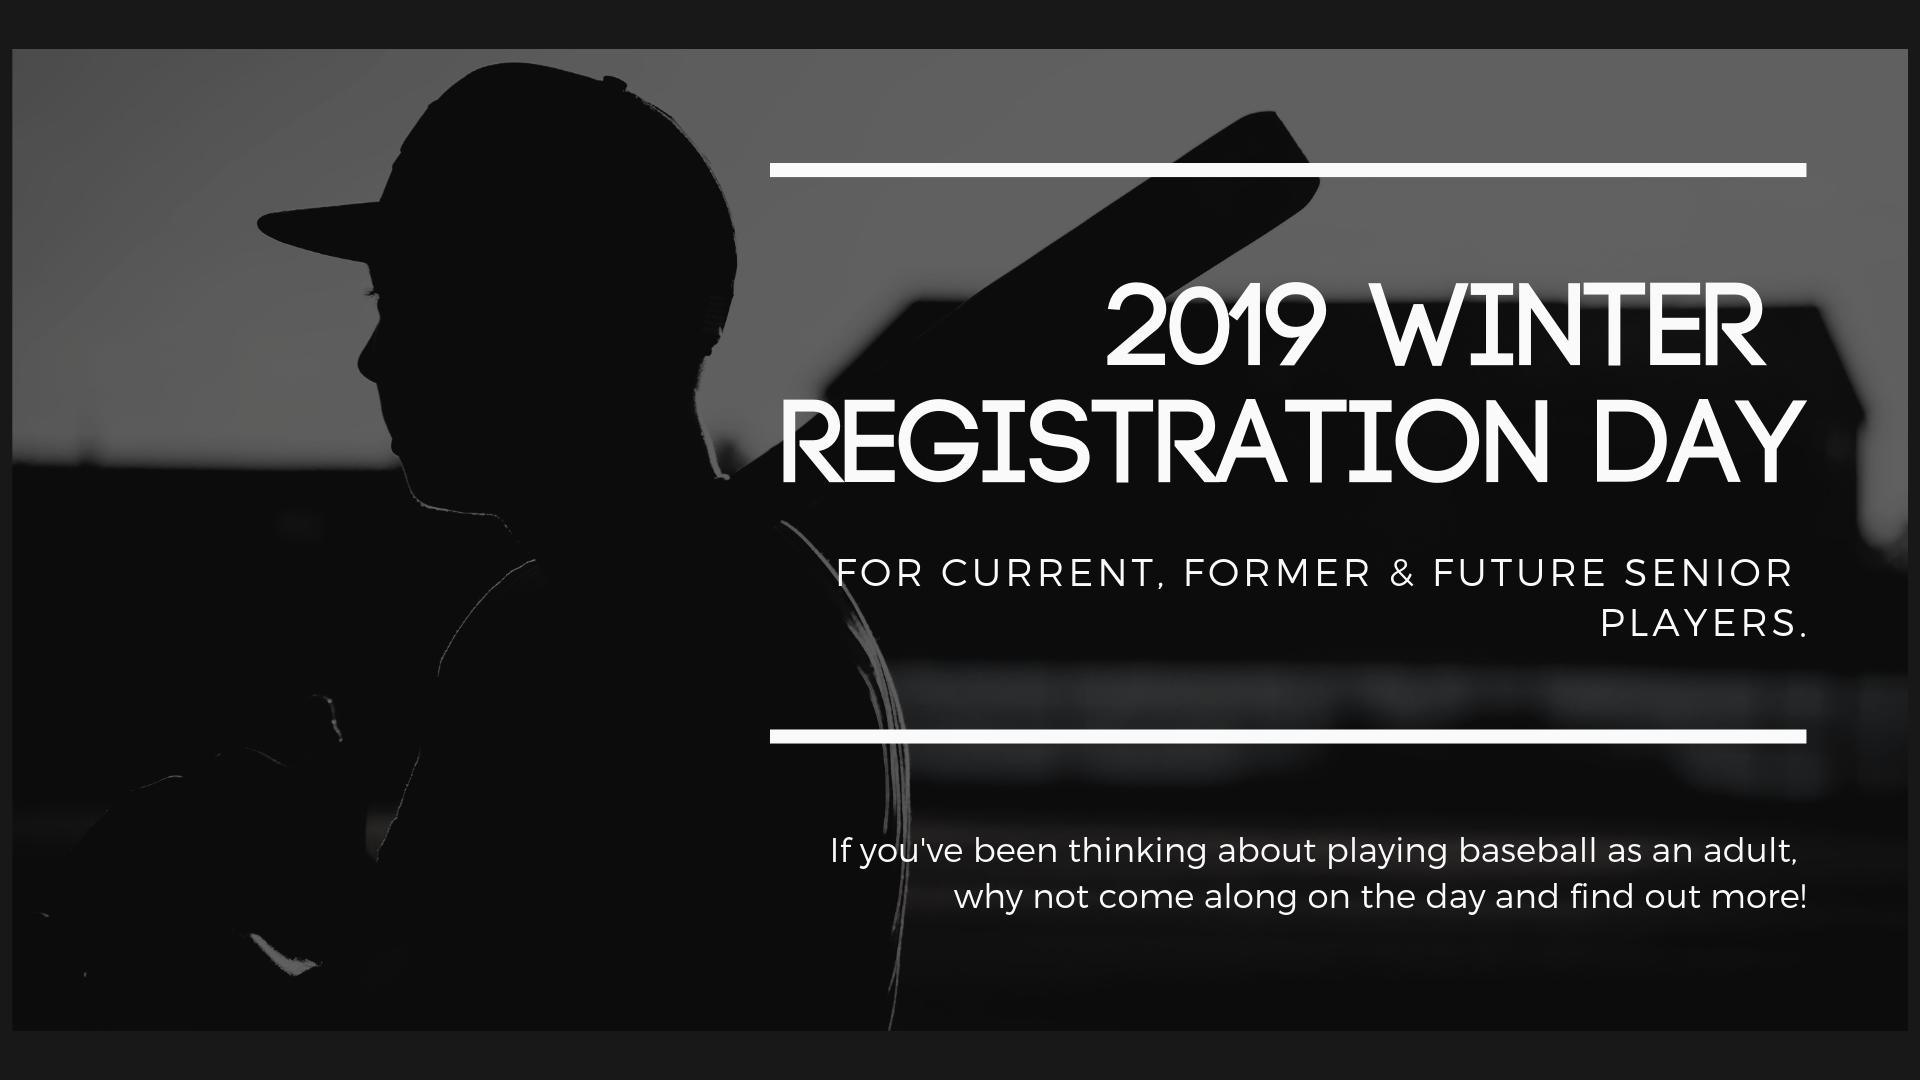 2019 Winter Registration Day